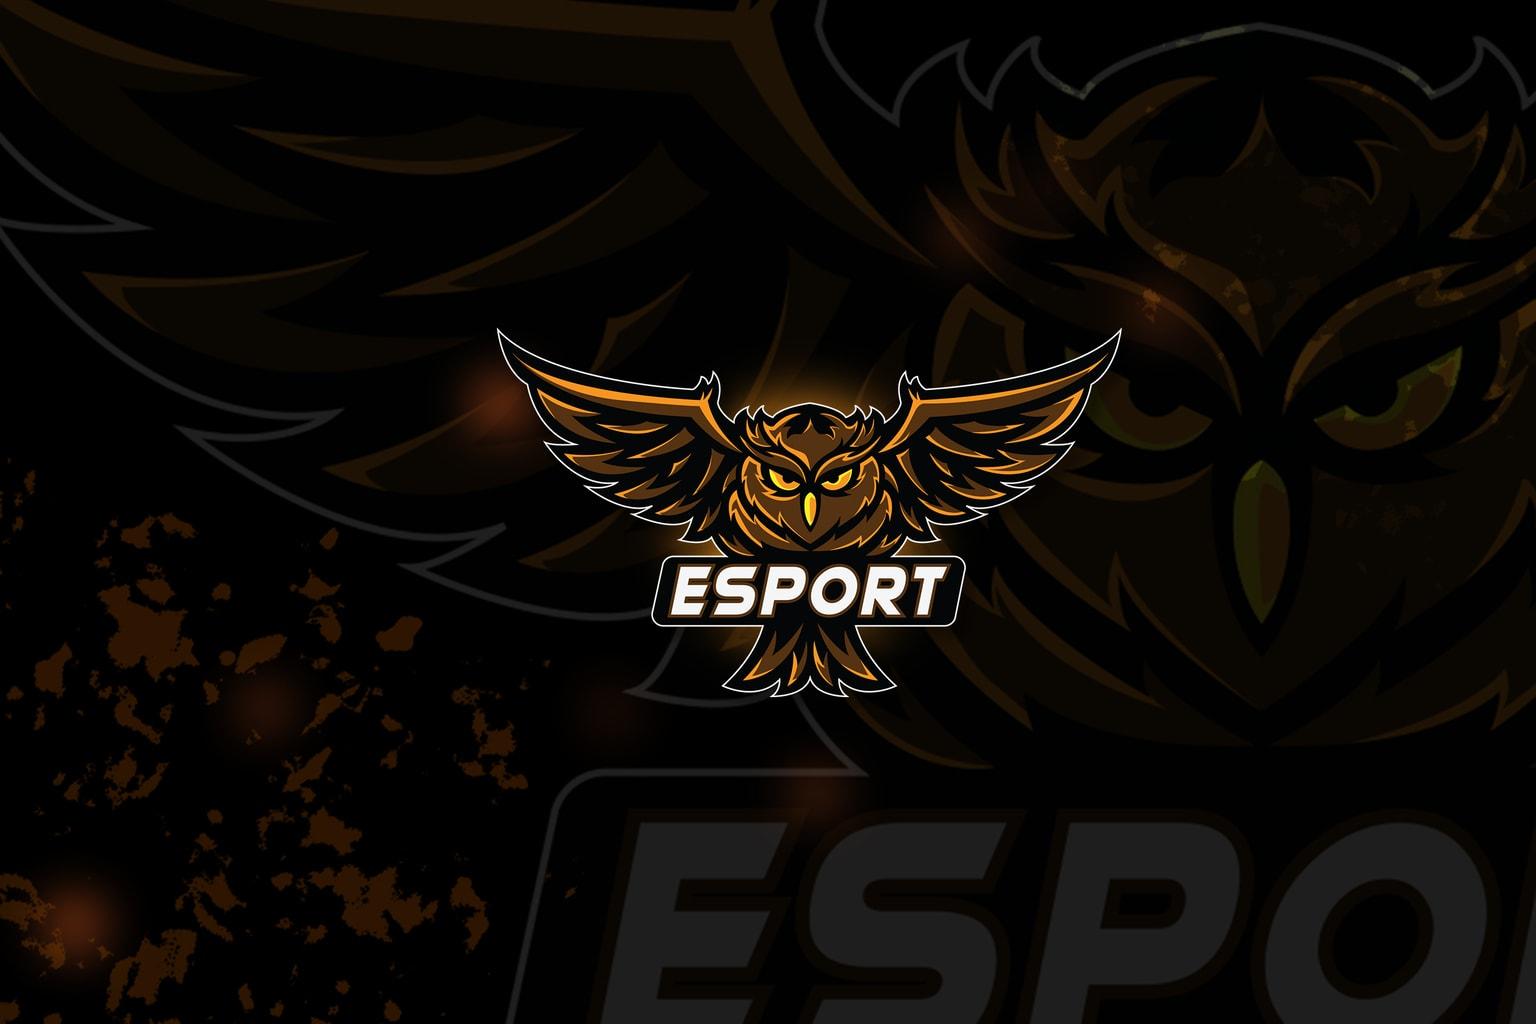 esport logo – eagle scouts 1